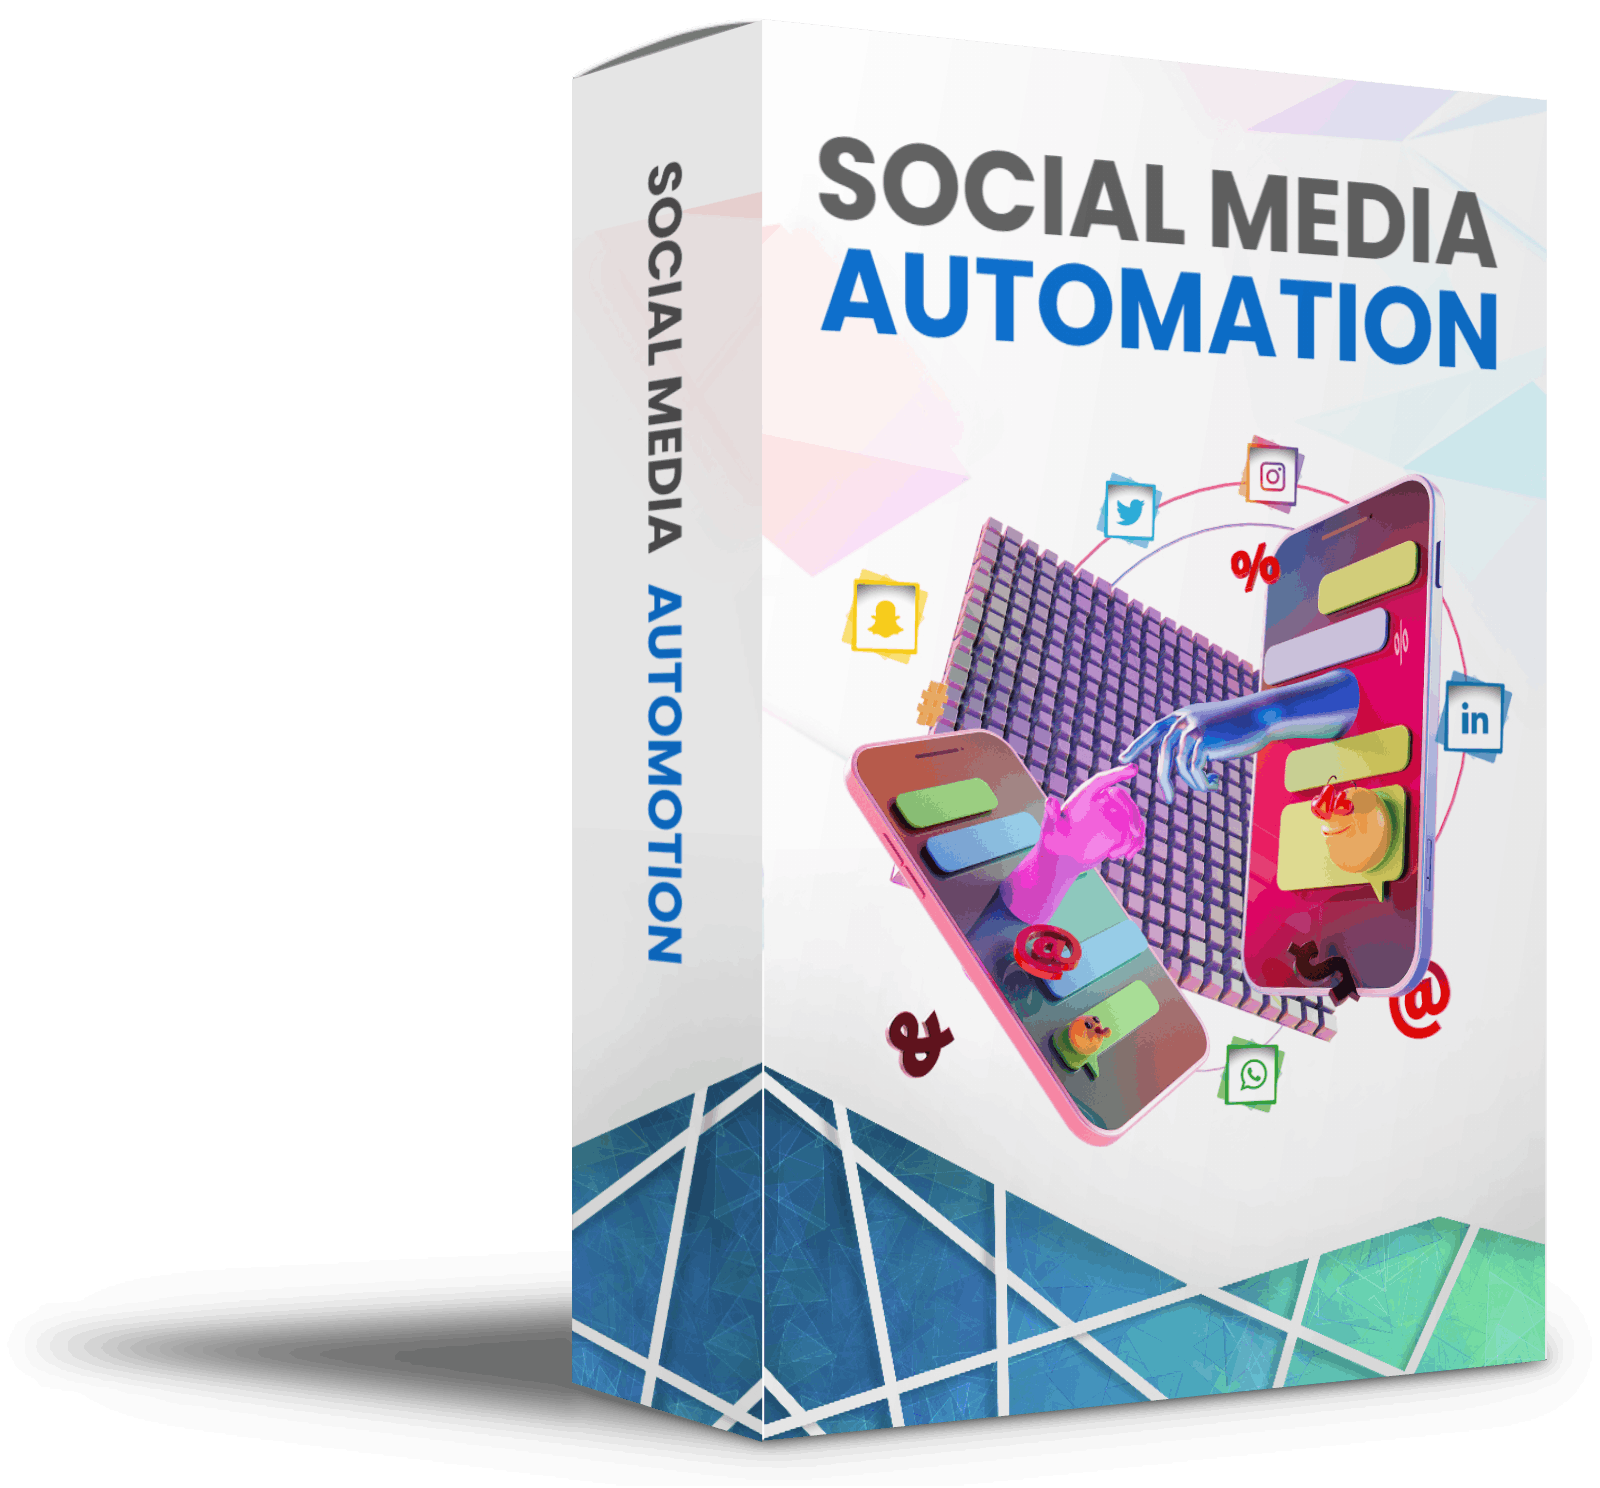 SOCIAL MEDIA AUTOMOTION 1